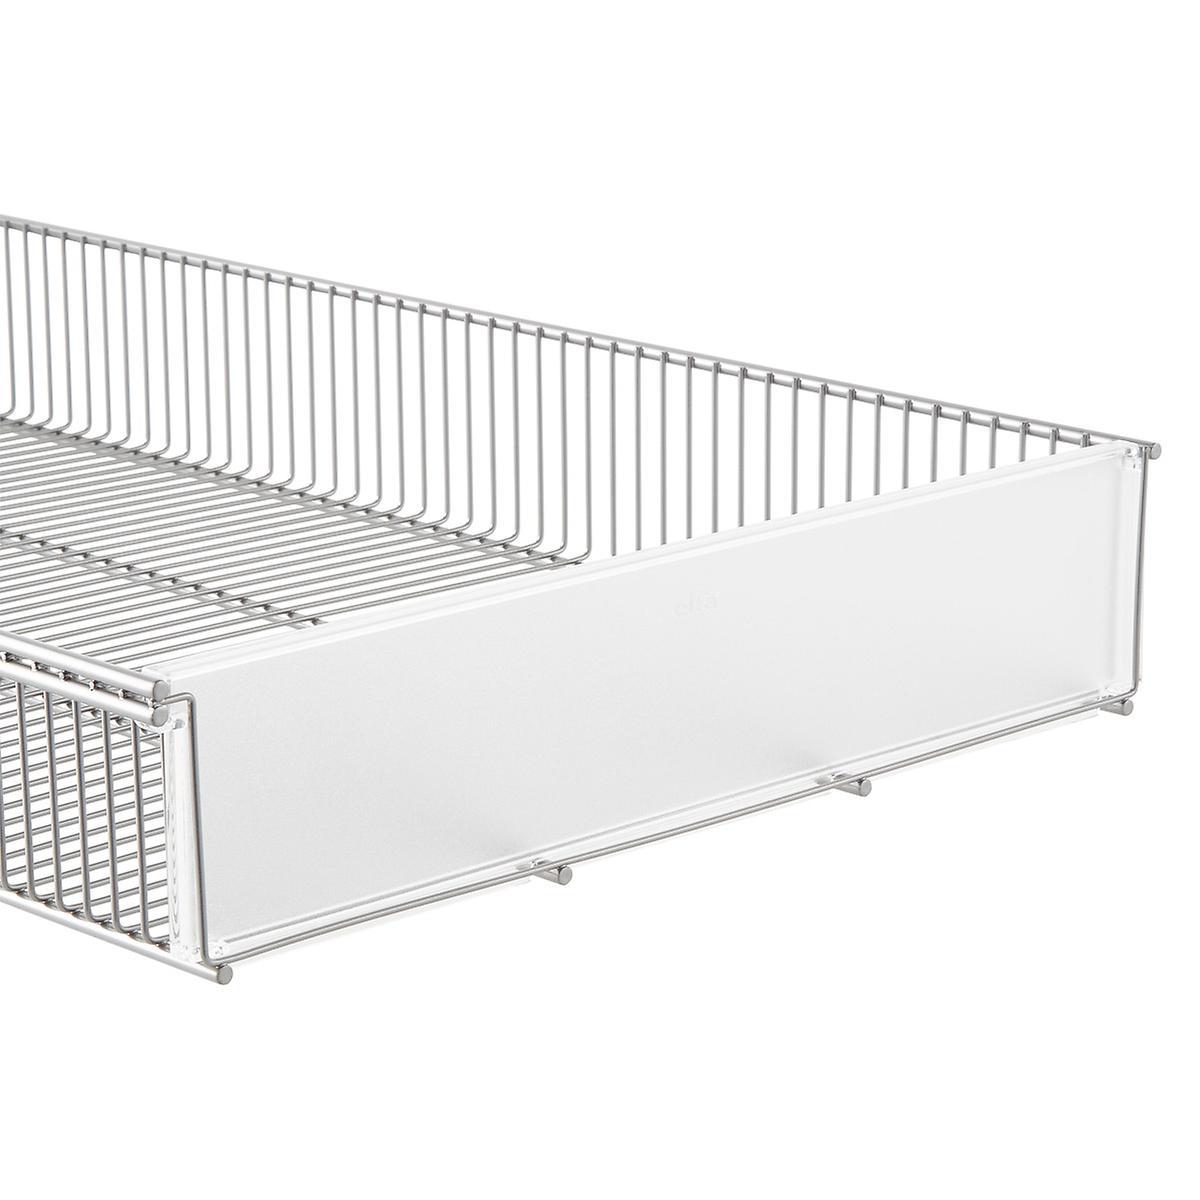 Clear Elfa Shelf Basket Dividers